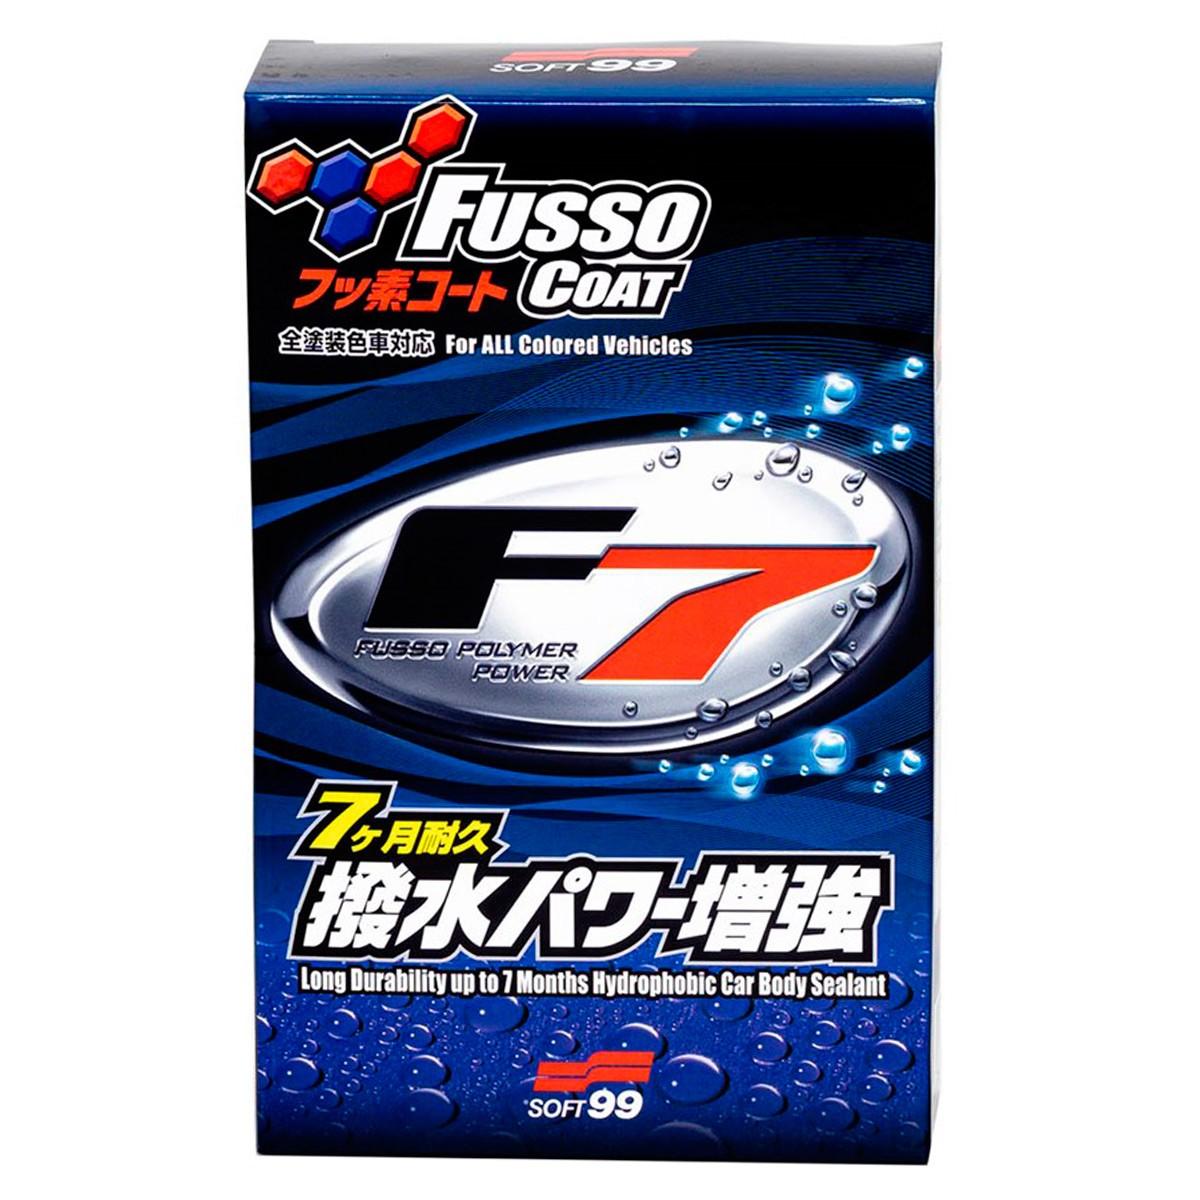 Fusso Coat Líquido F7 300ml- Soft99